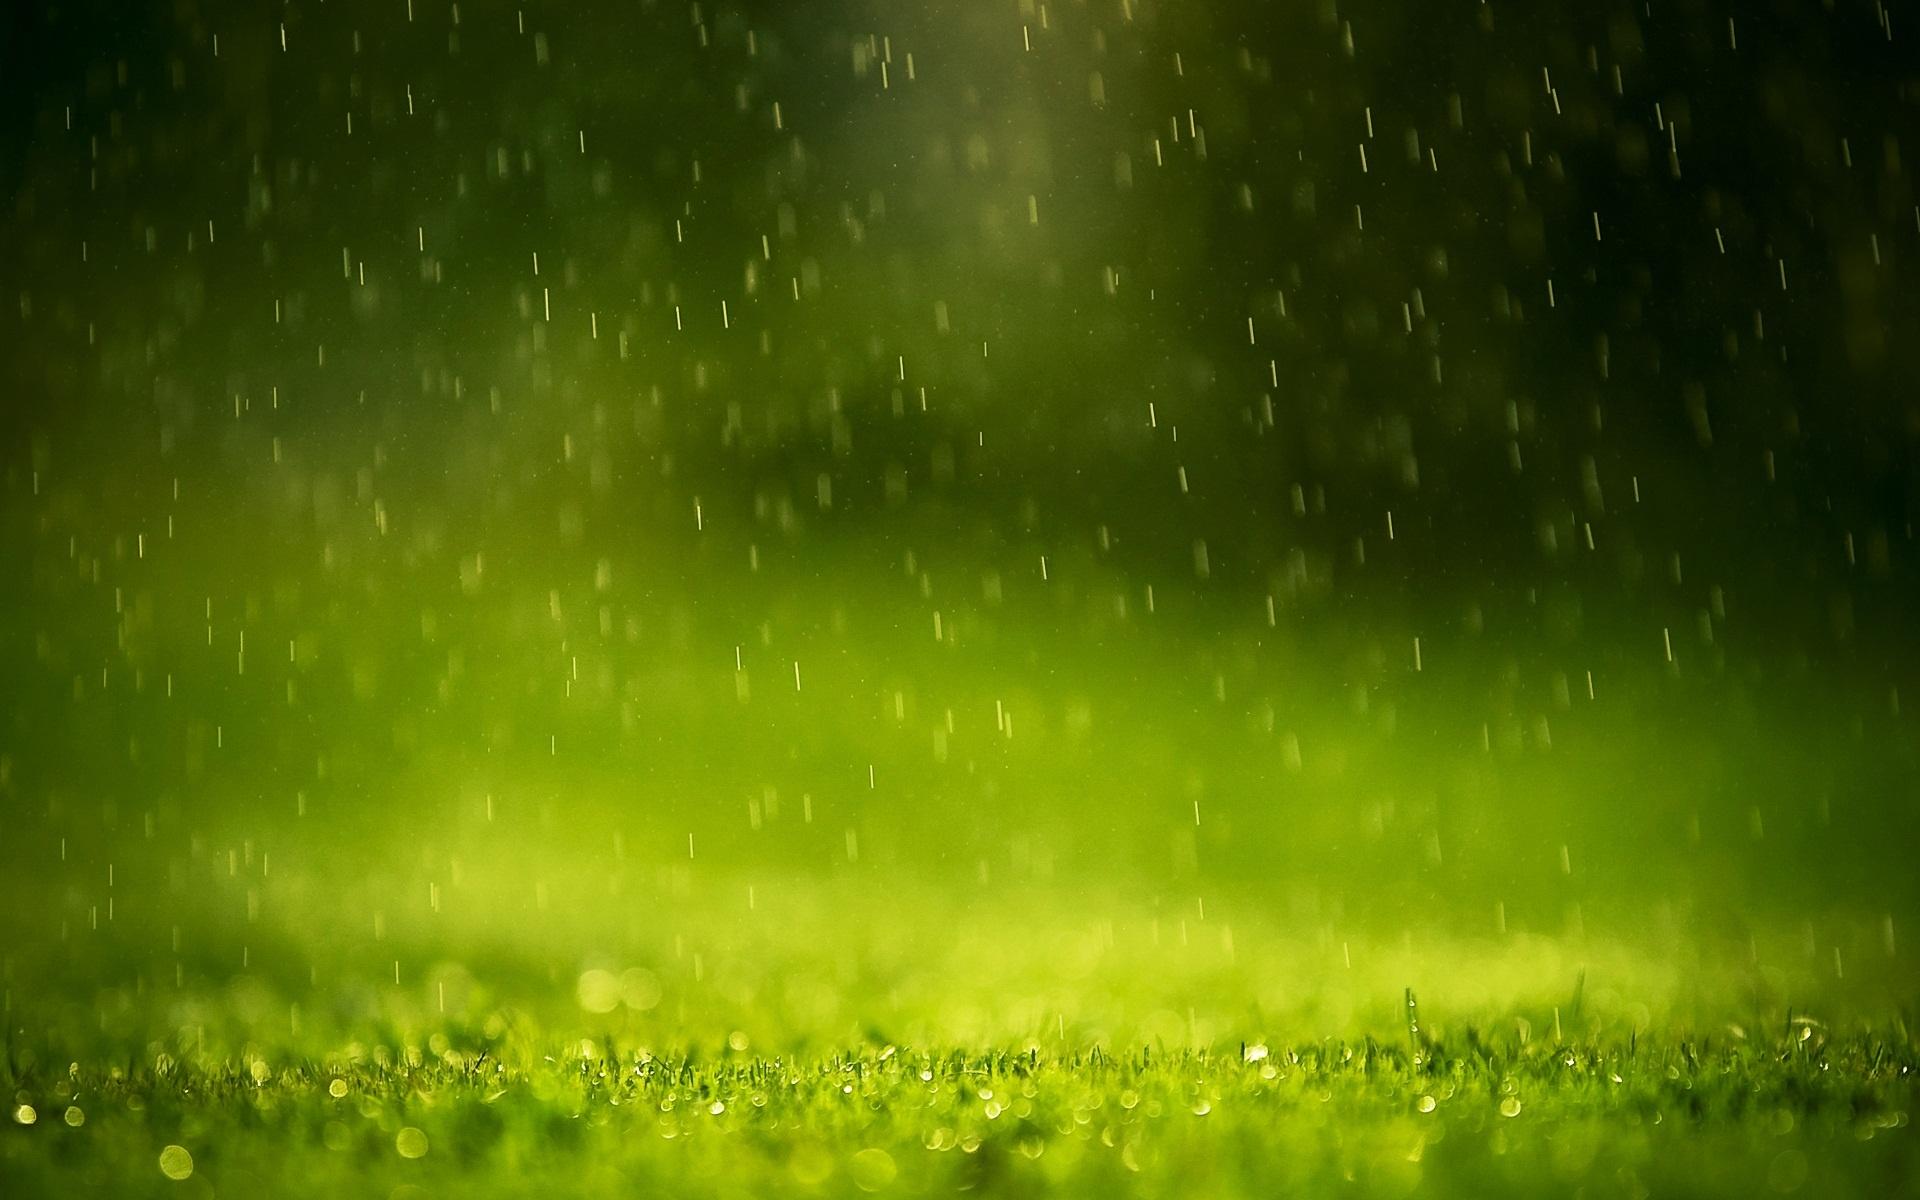 Rain Drops Wallpapers HD Desktop Wallpapers 1920x1200